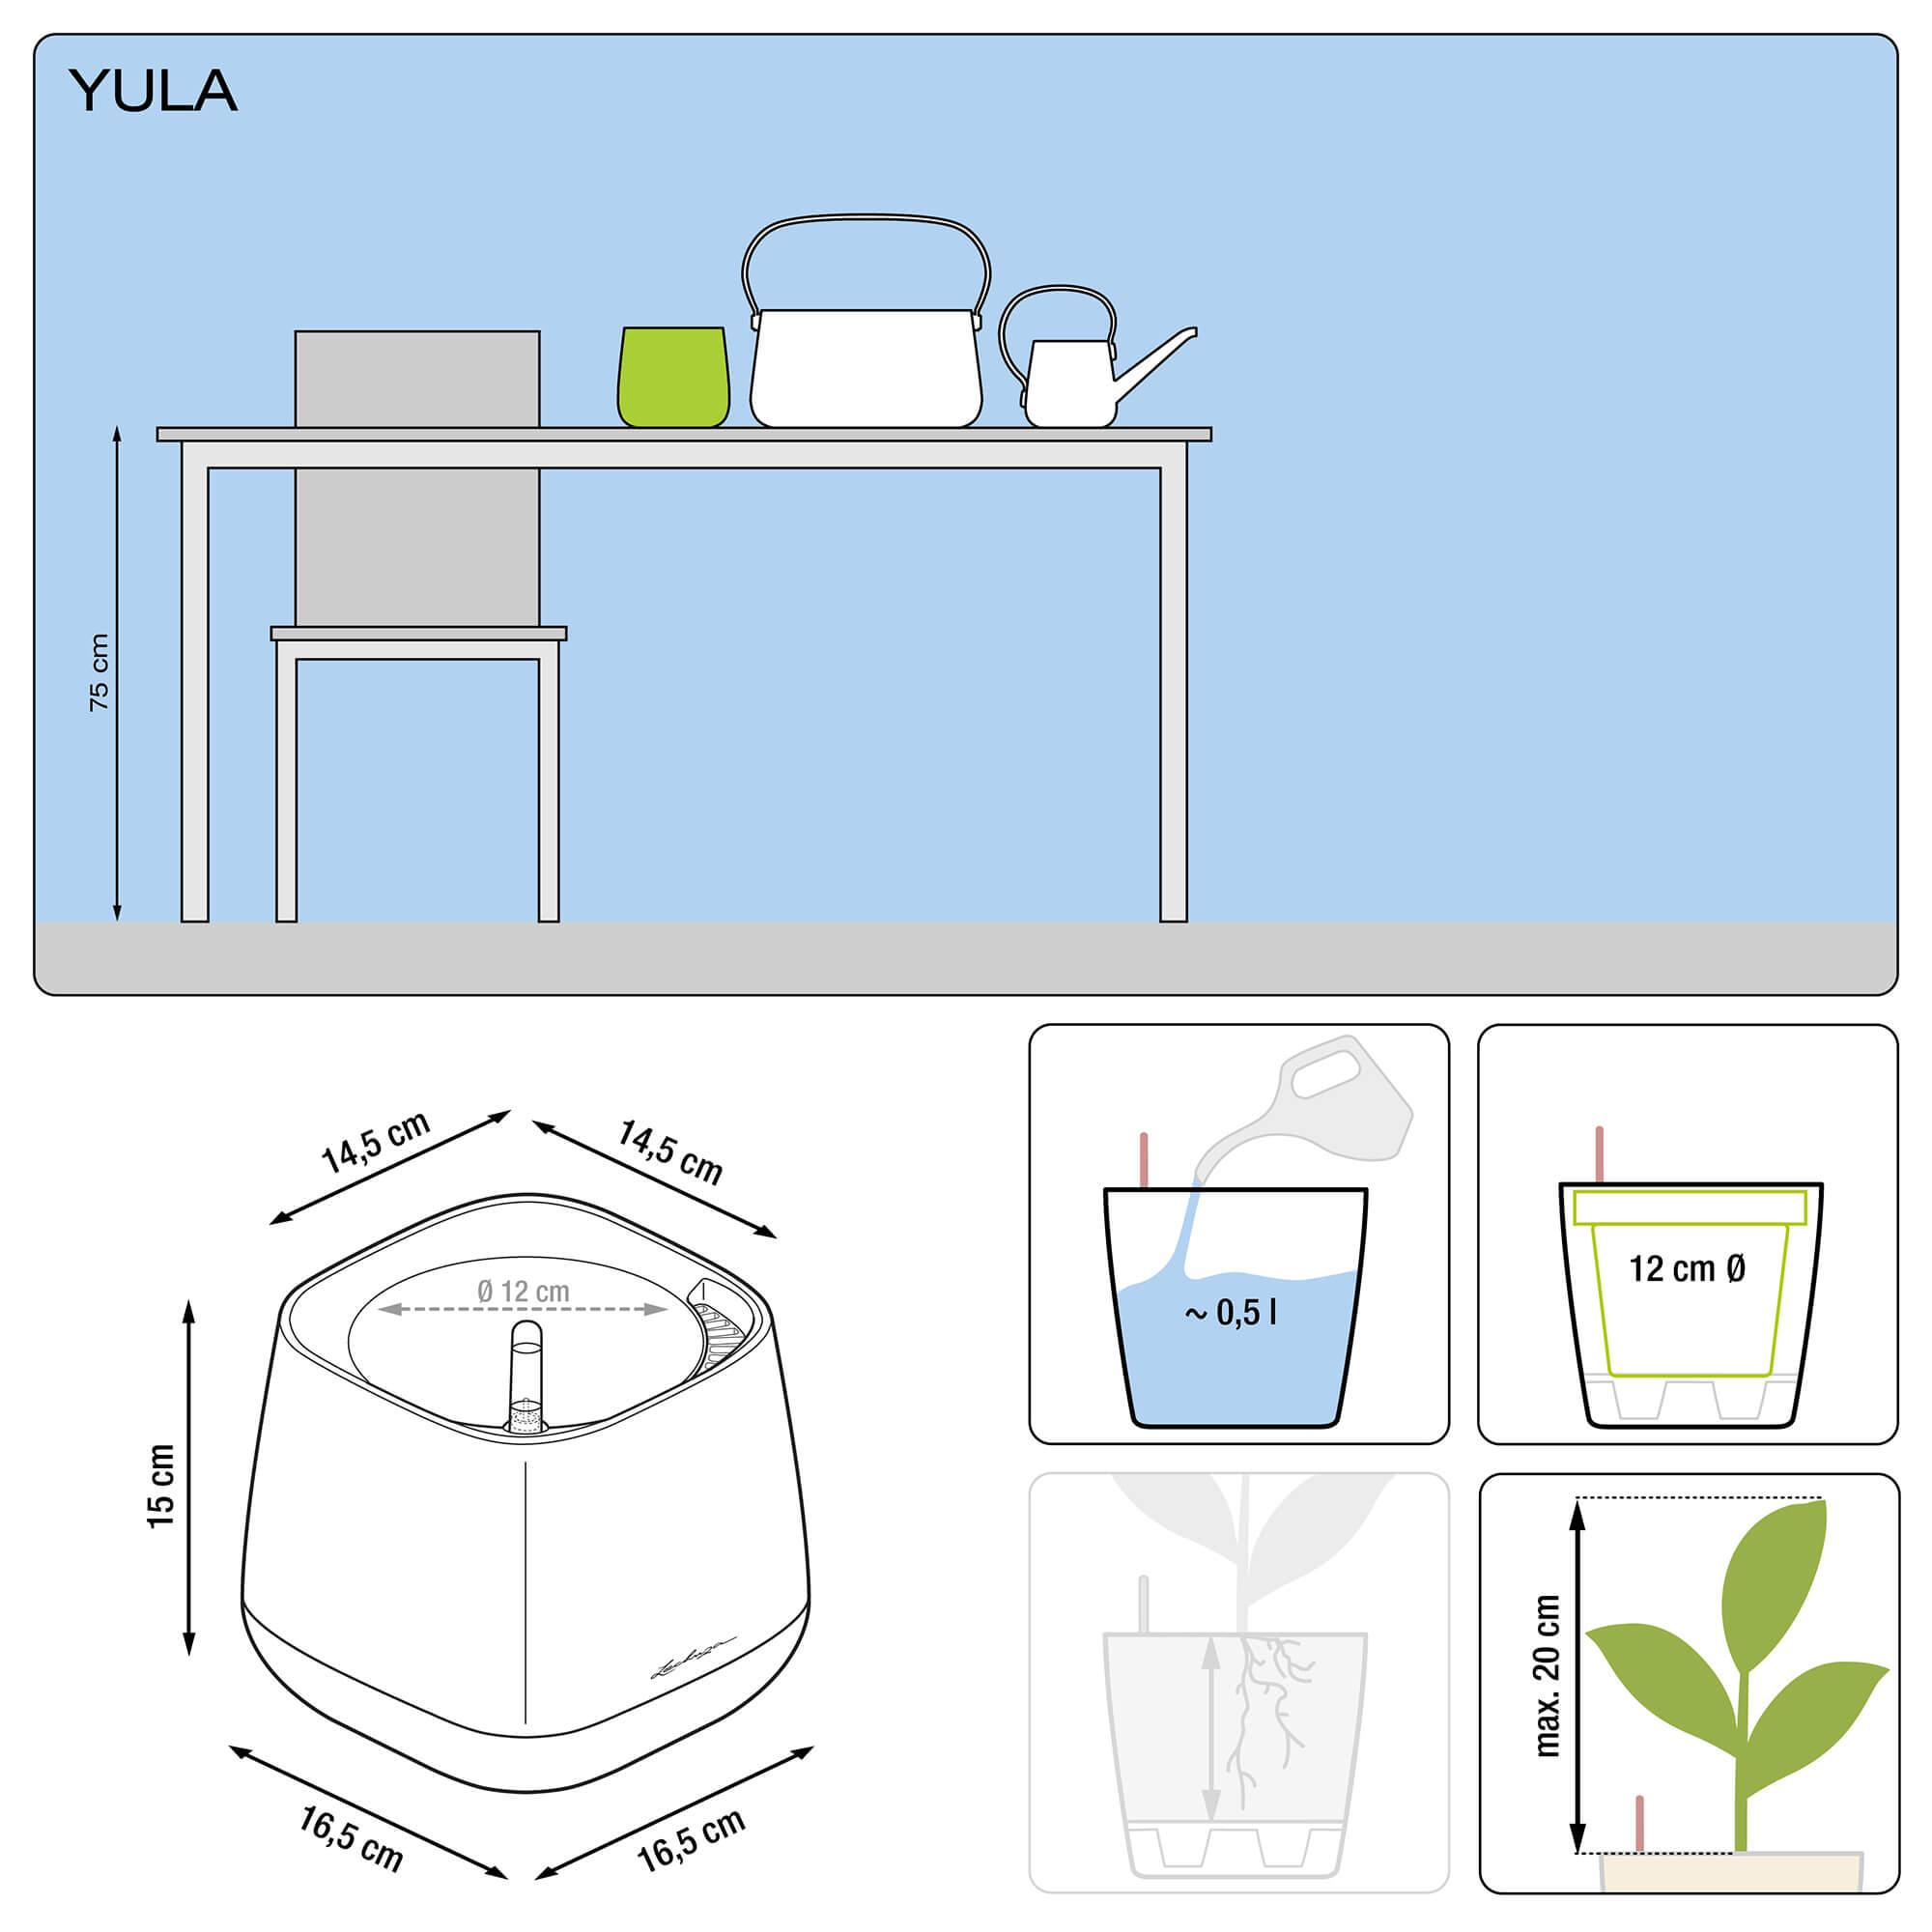 YULA planter white/gray semi-gloss - Image 2